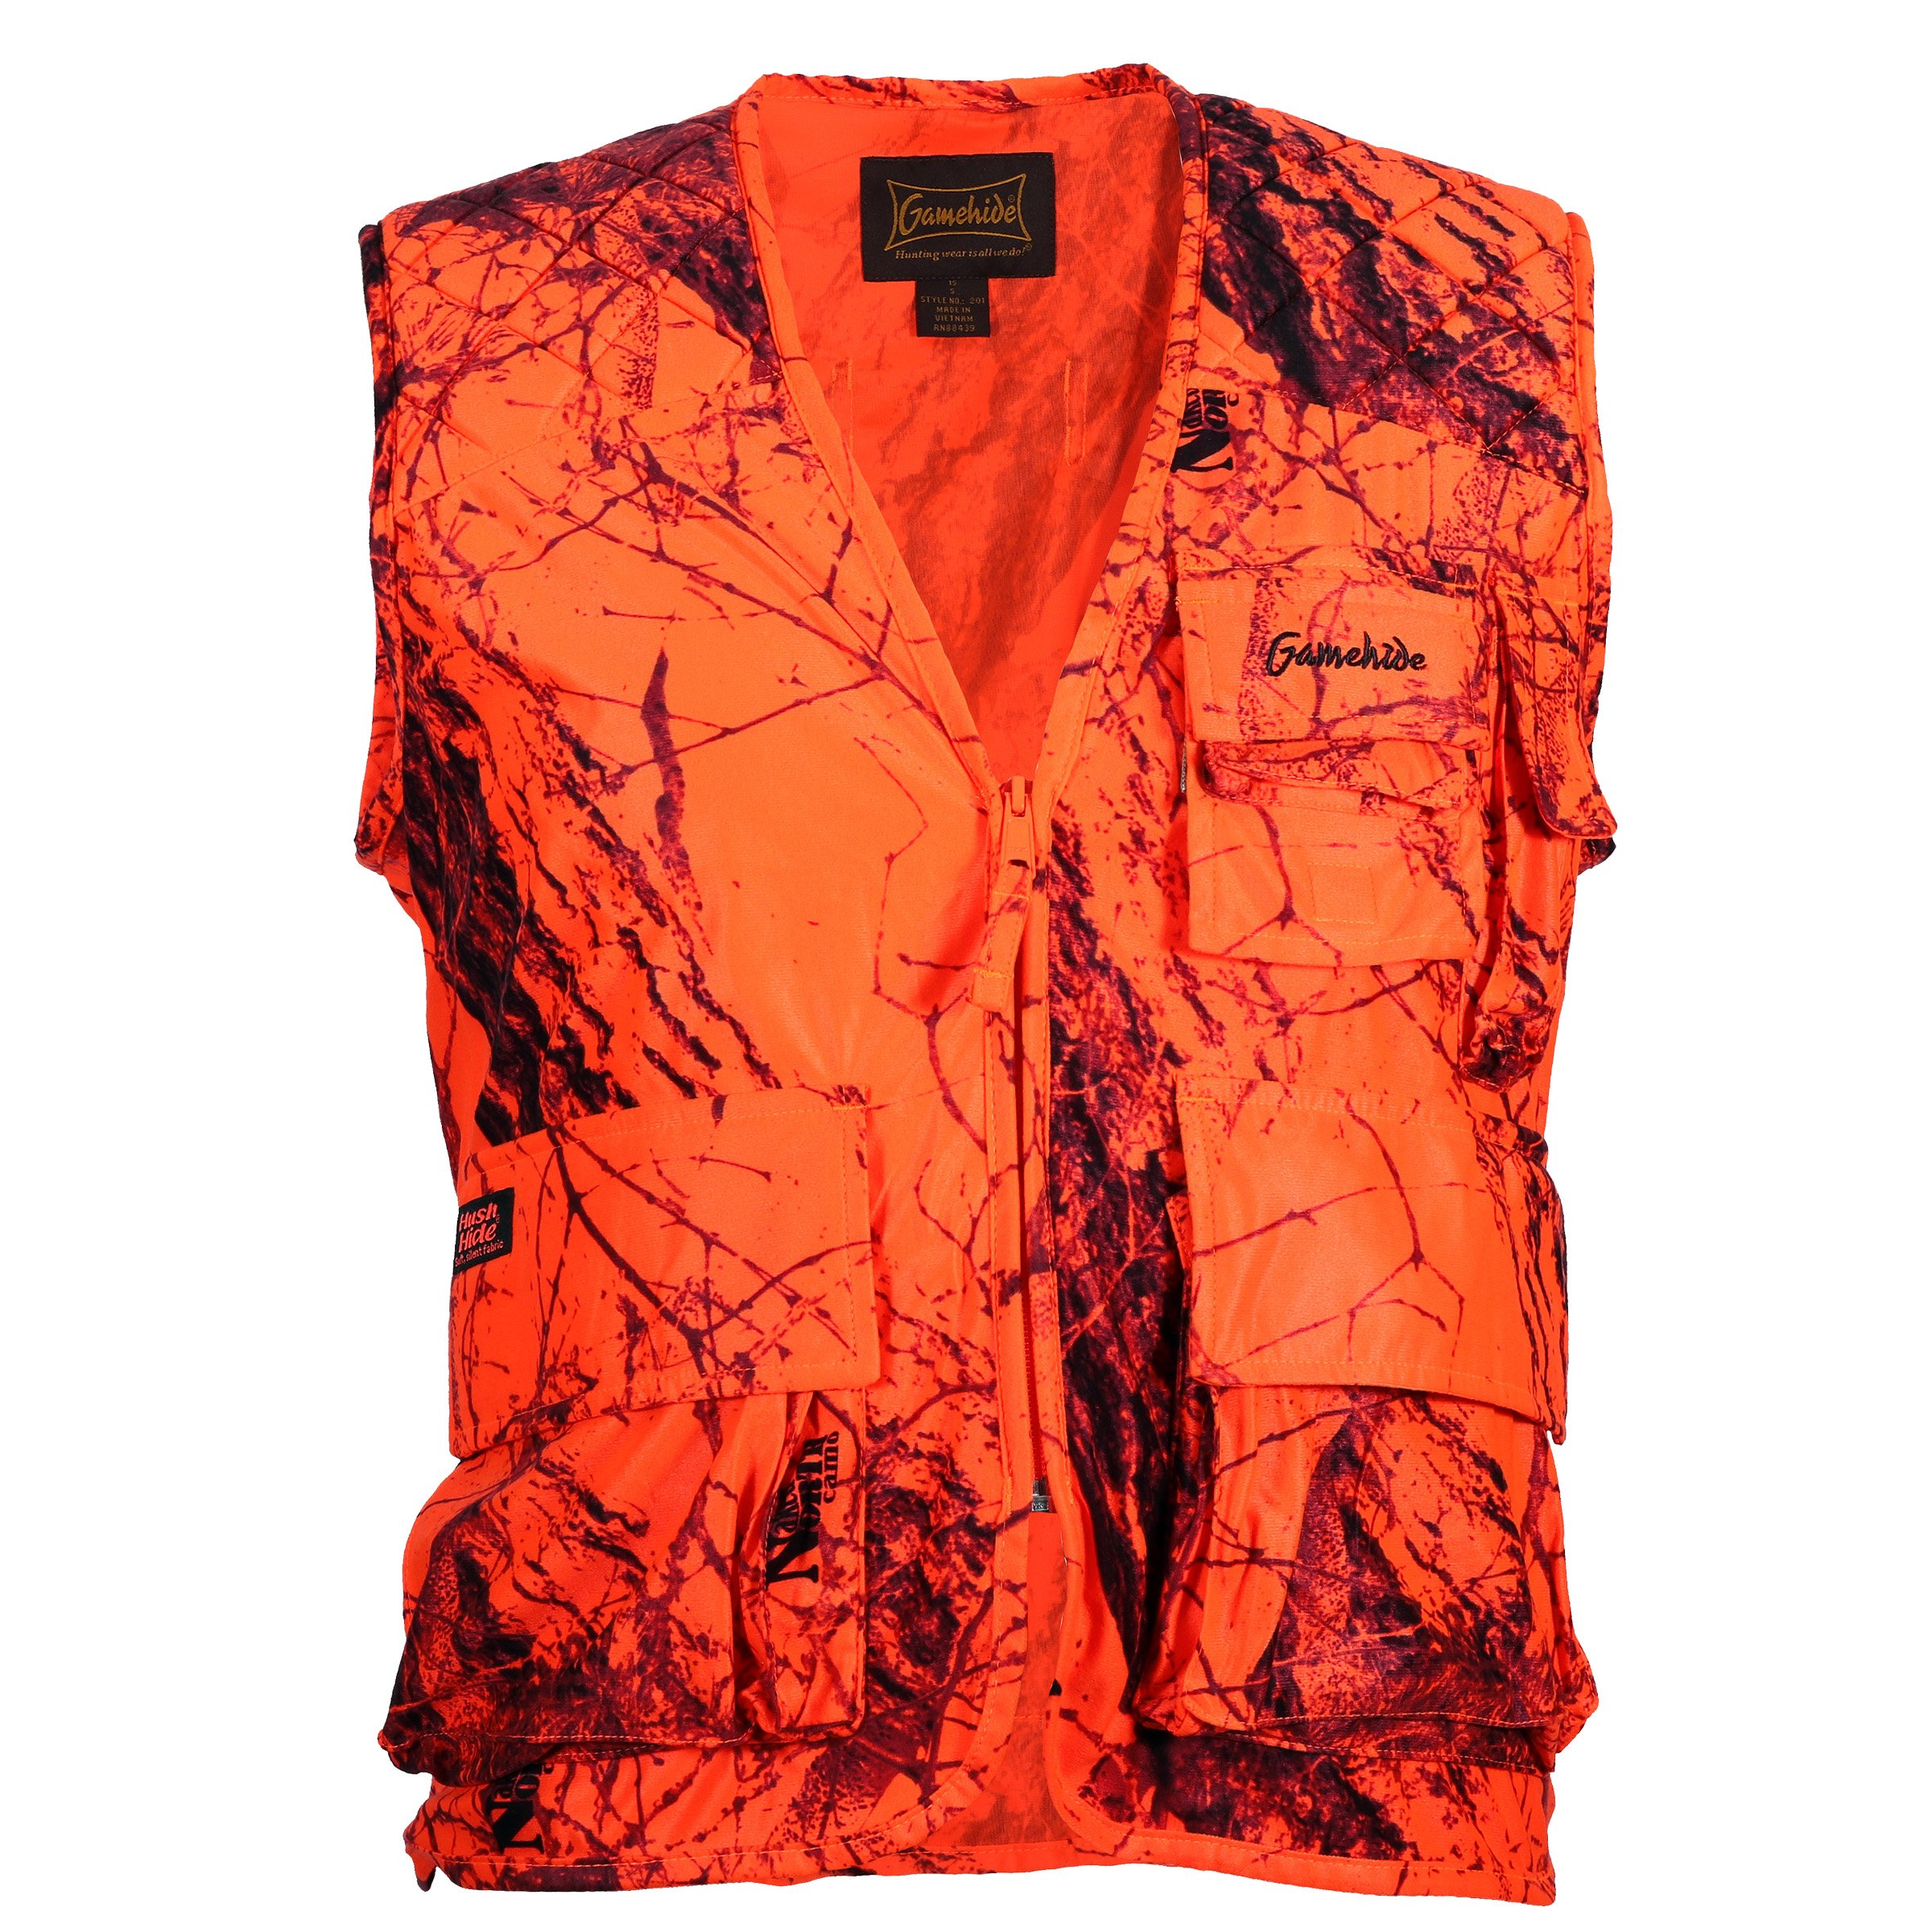 Gamehide Sneaker Big Game Vest Blaze Camo, 2X-Large by Gamehide